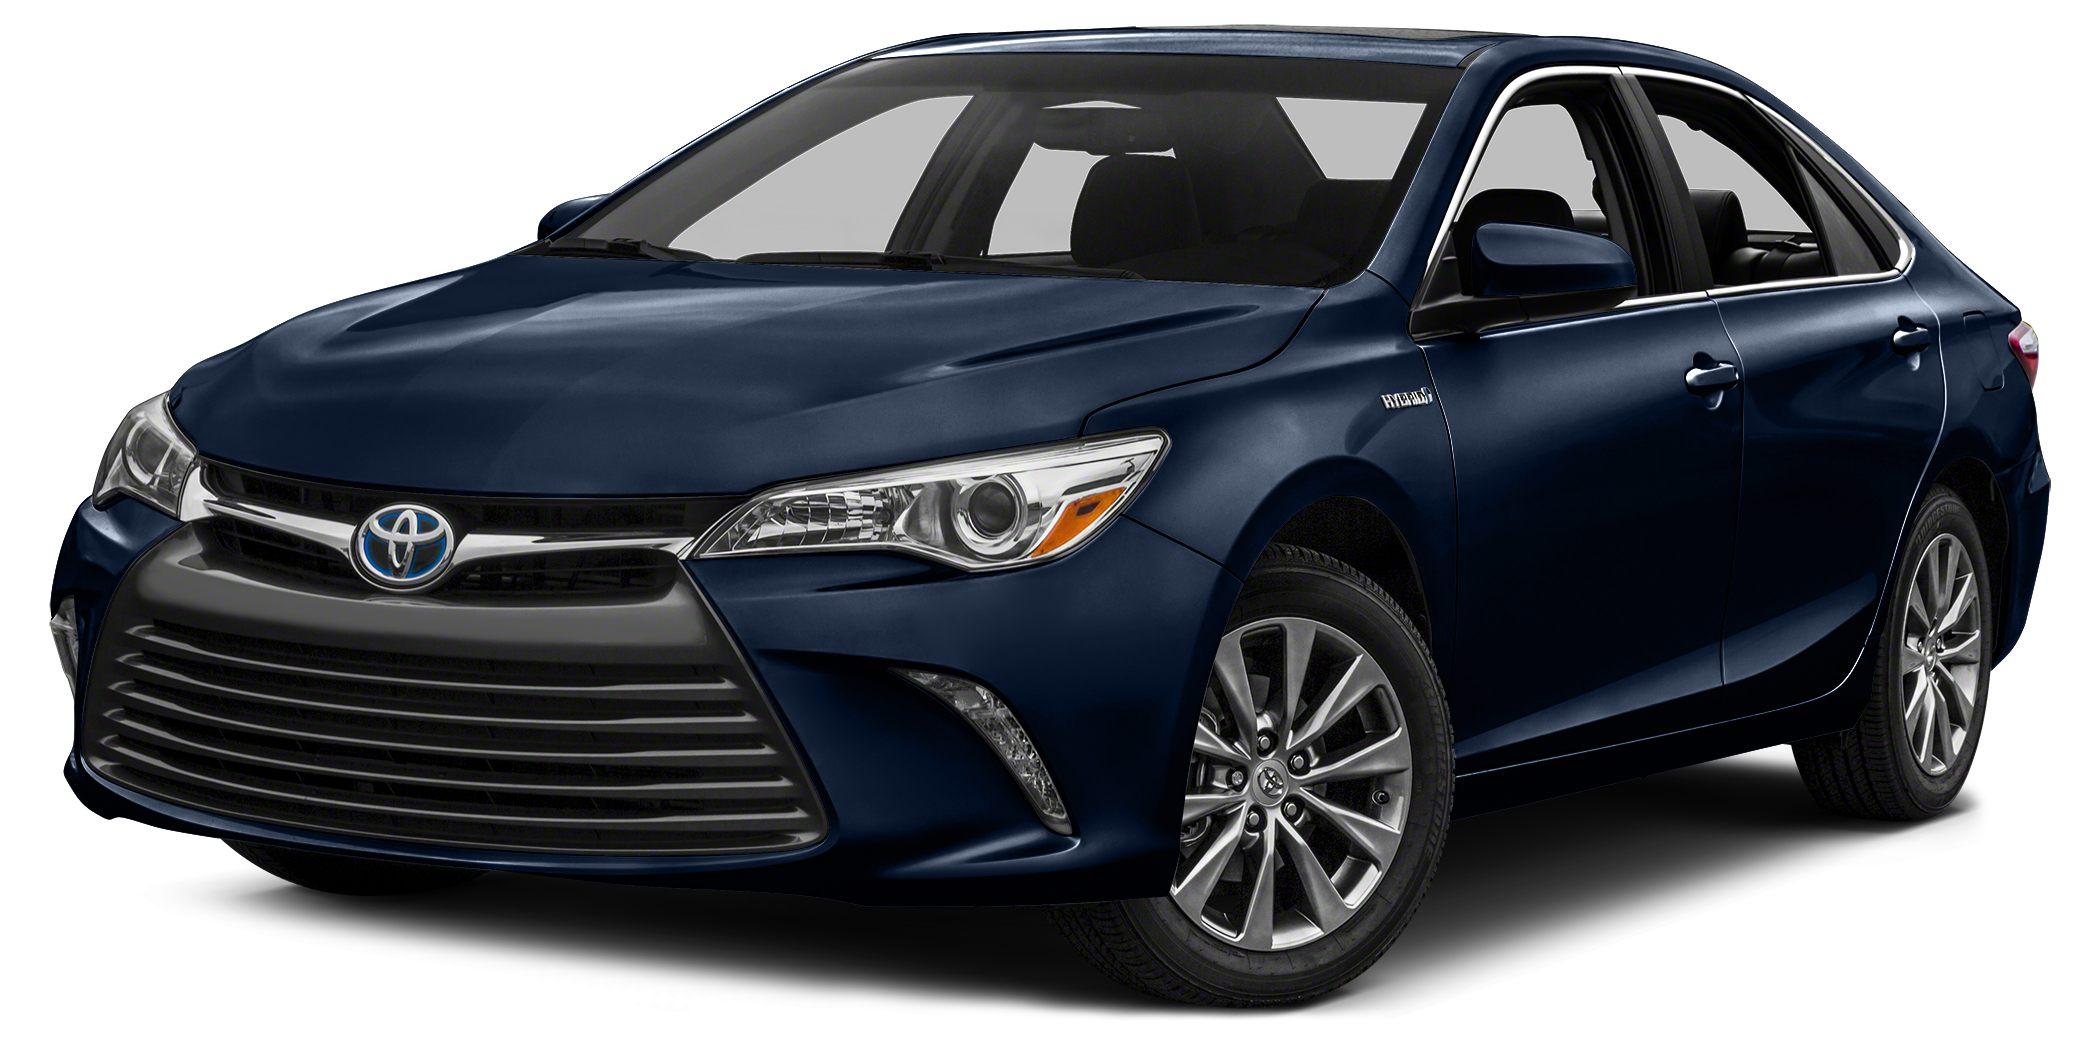 2017 Toyota Camry Hybrid XLE Heated Leather Seats Keyless Start Dual Zone AC Hybrid Aluminum